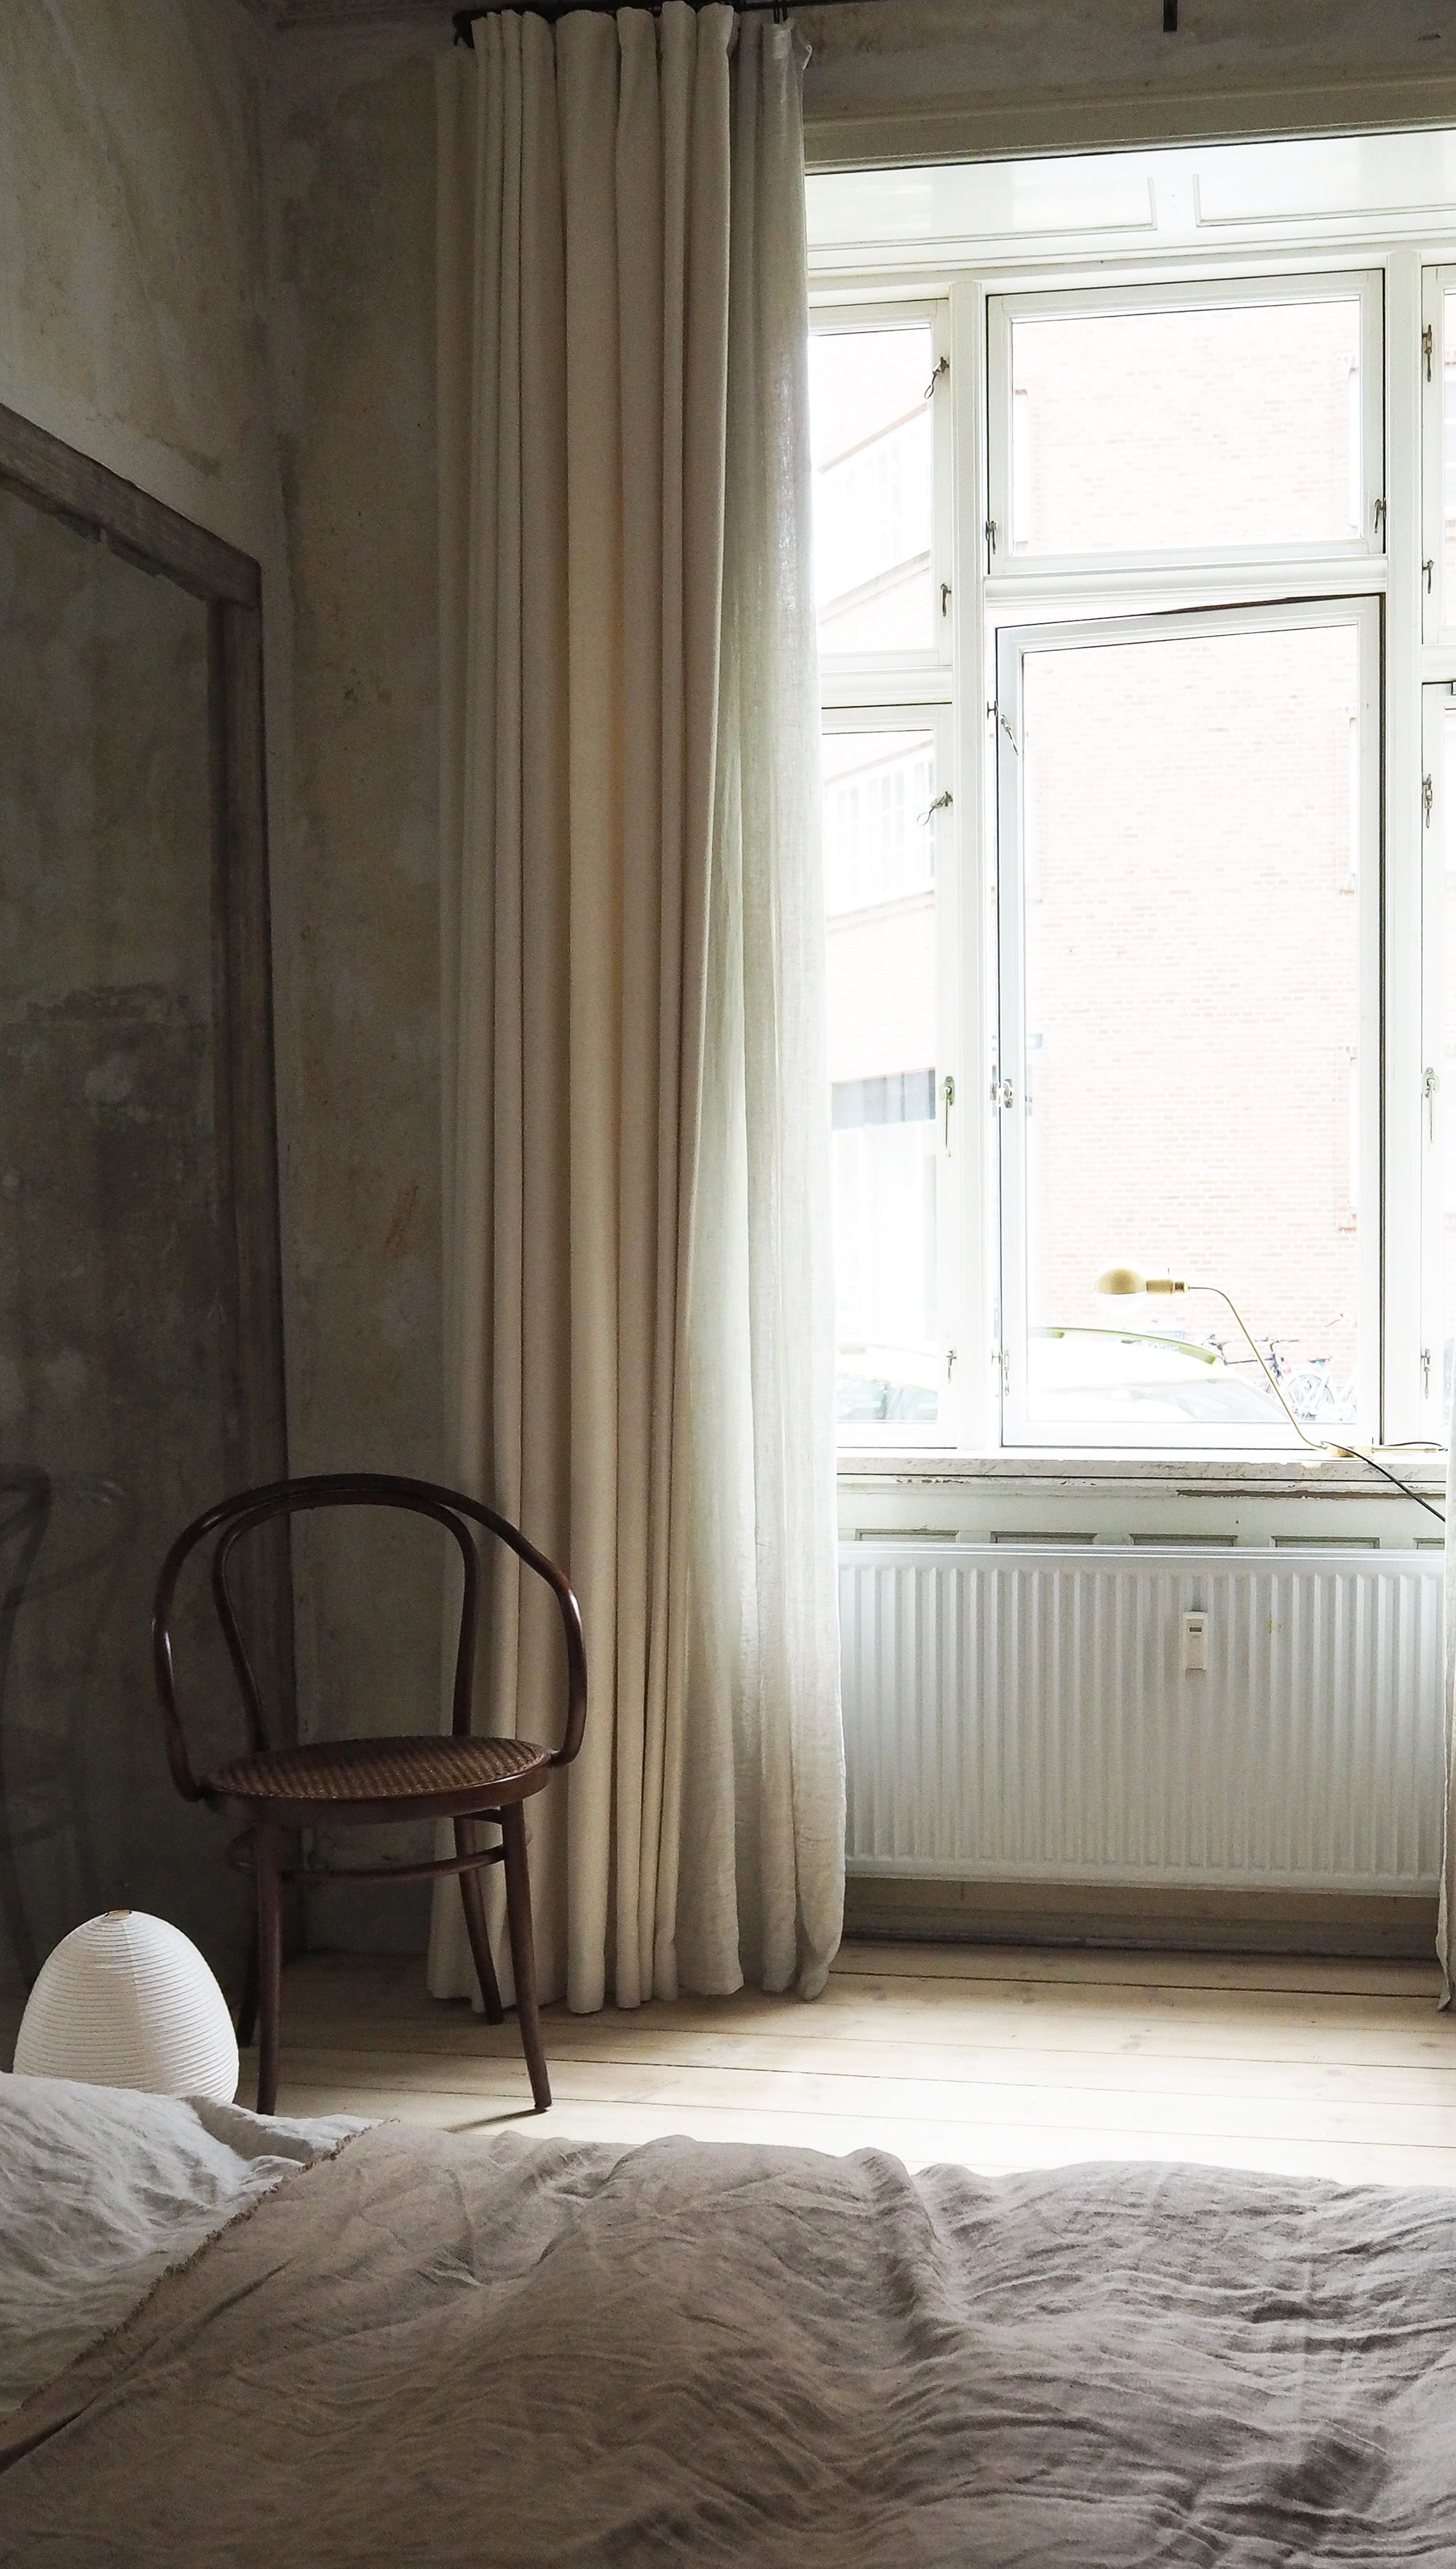 The Frama apartment, a holistic approach #minimalbedroom